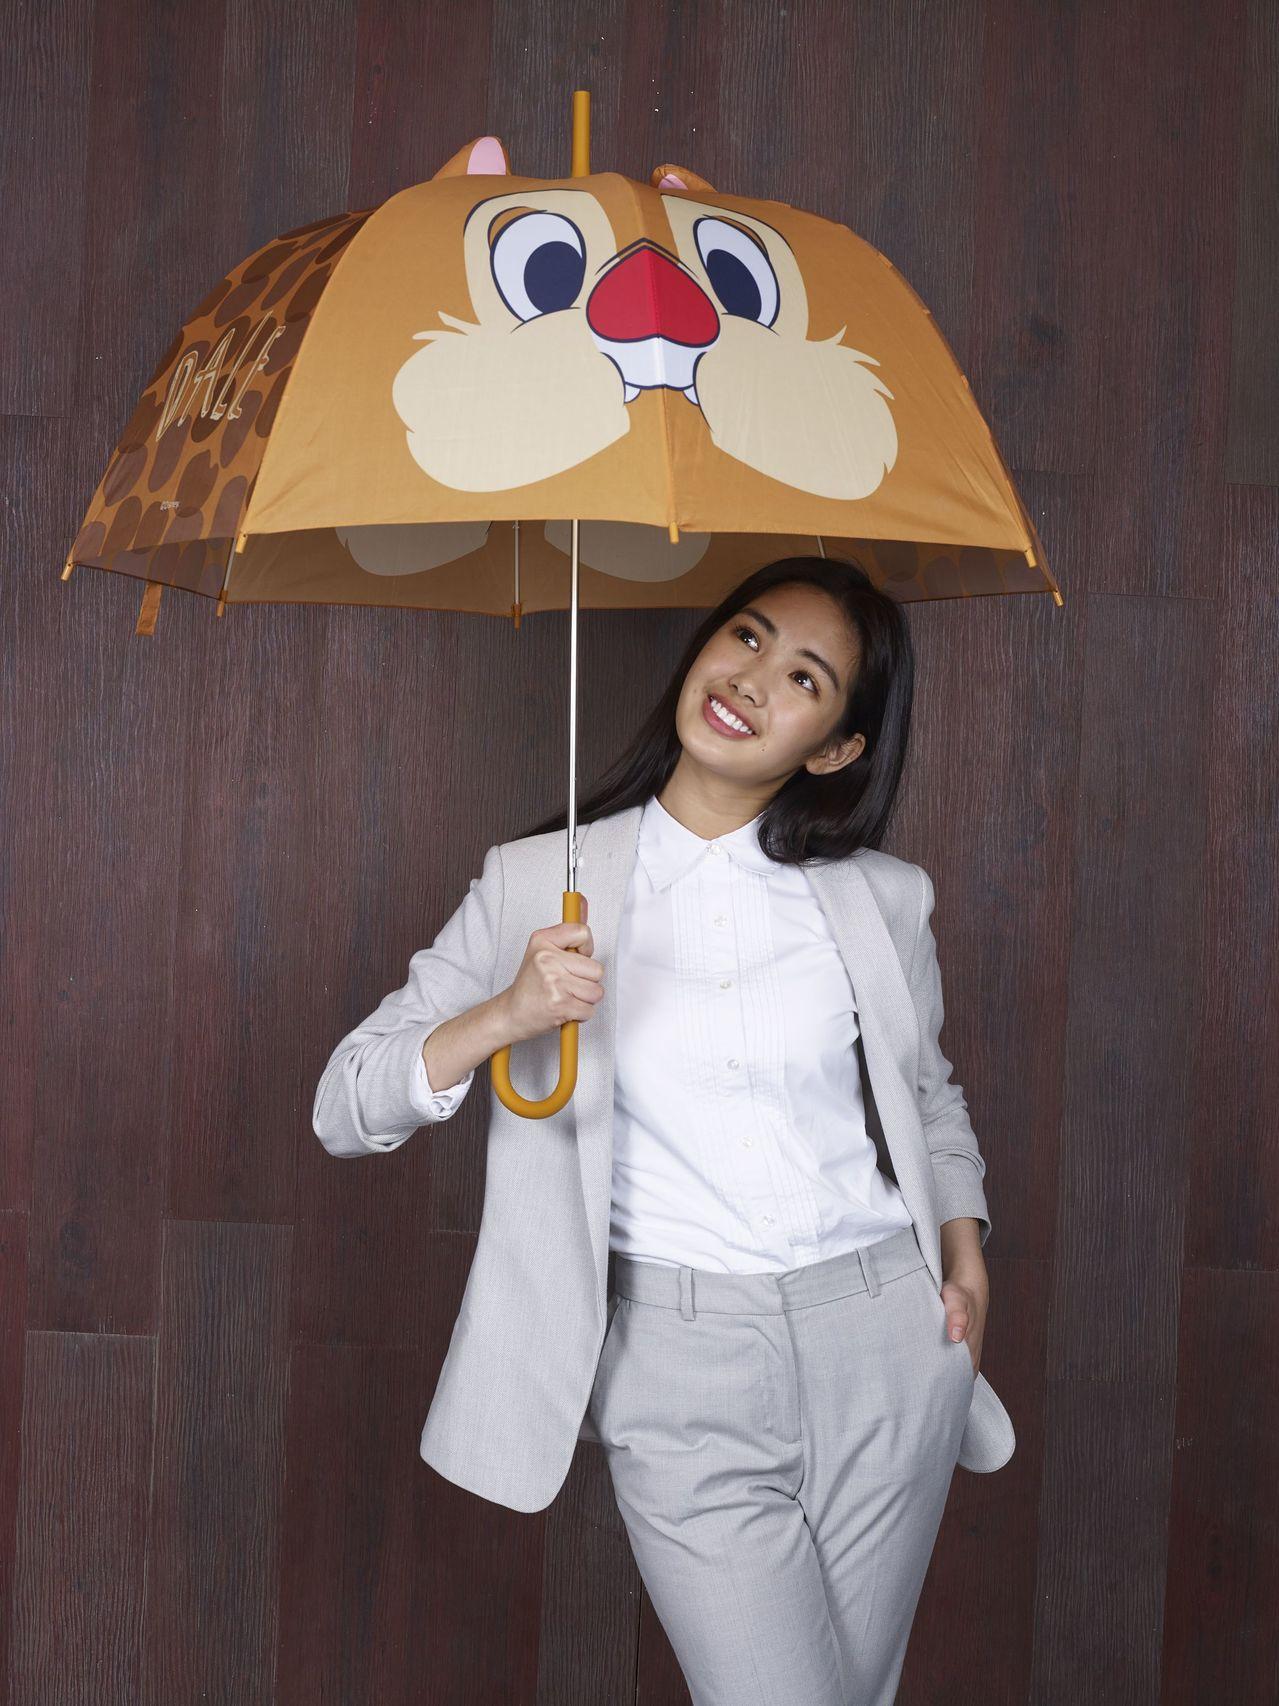 7-ELEVEN「迪士尼夢幻露營」限量蘑菇造型傘,4月24日起集滿6點加199元...